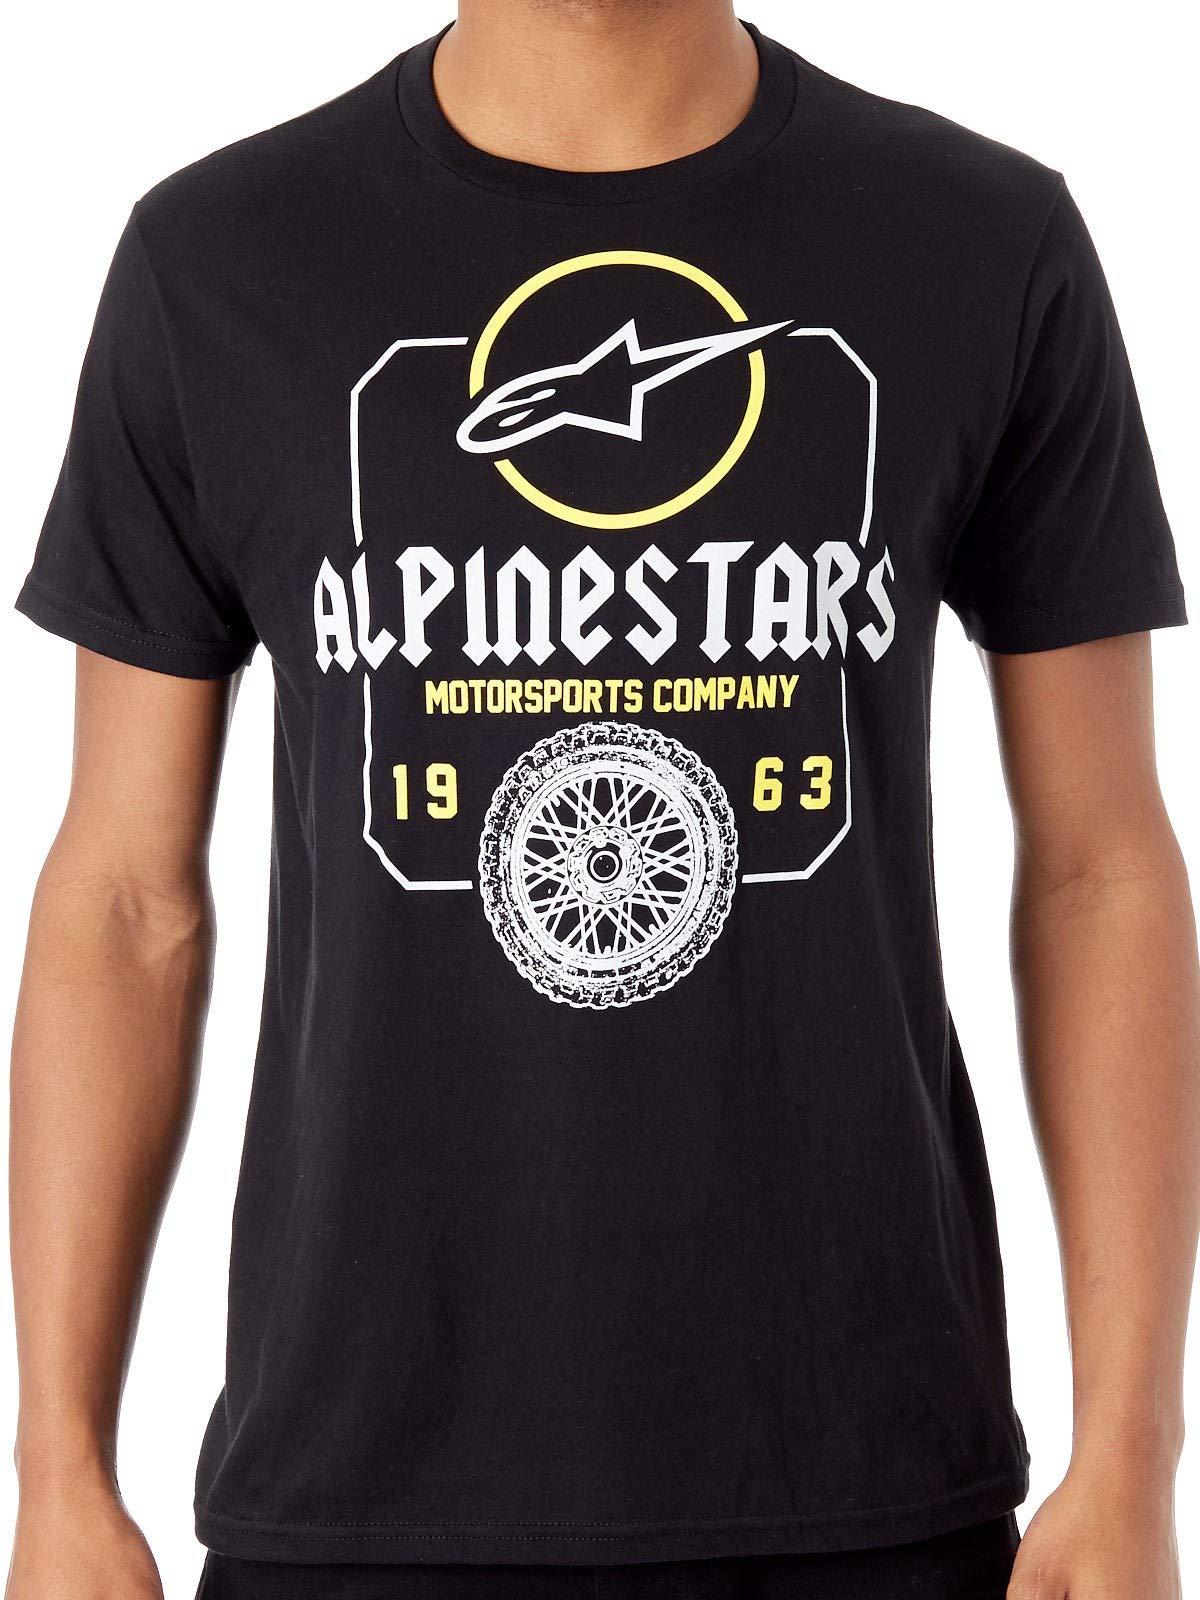 Alpinestars Unisex-Adult's Whiteout Tee, Black, 2XL